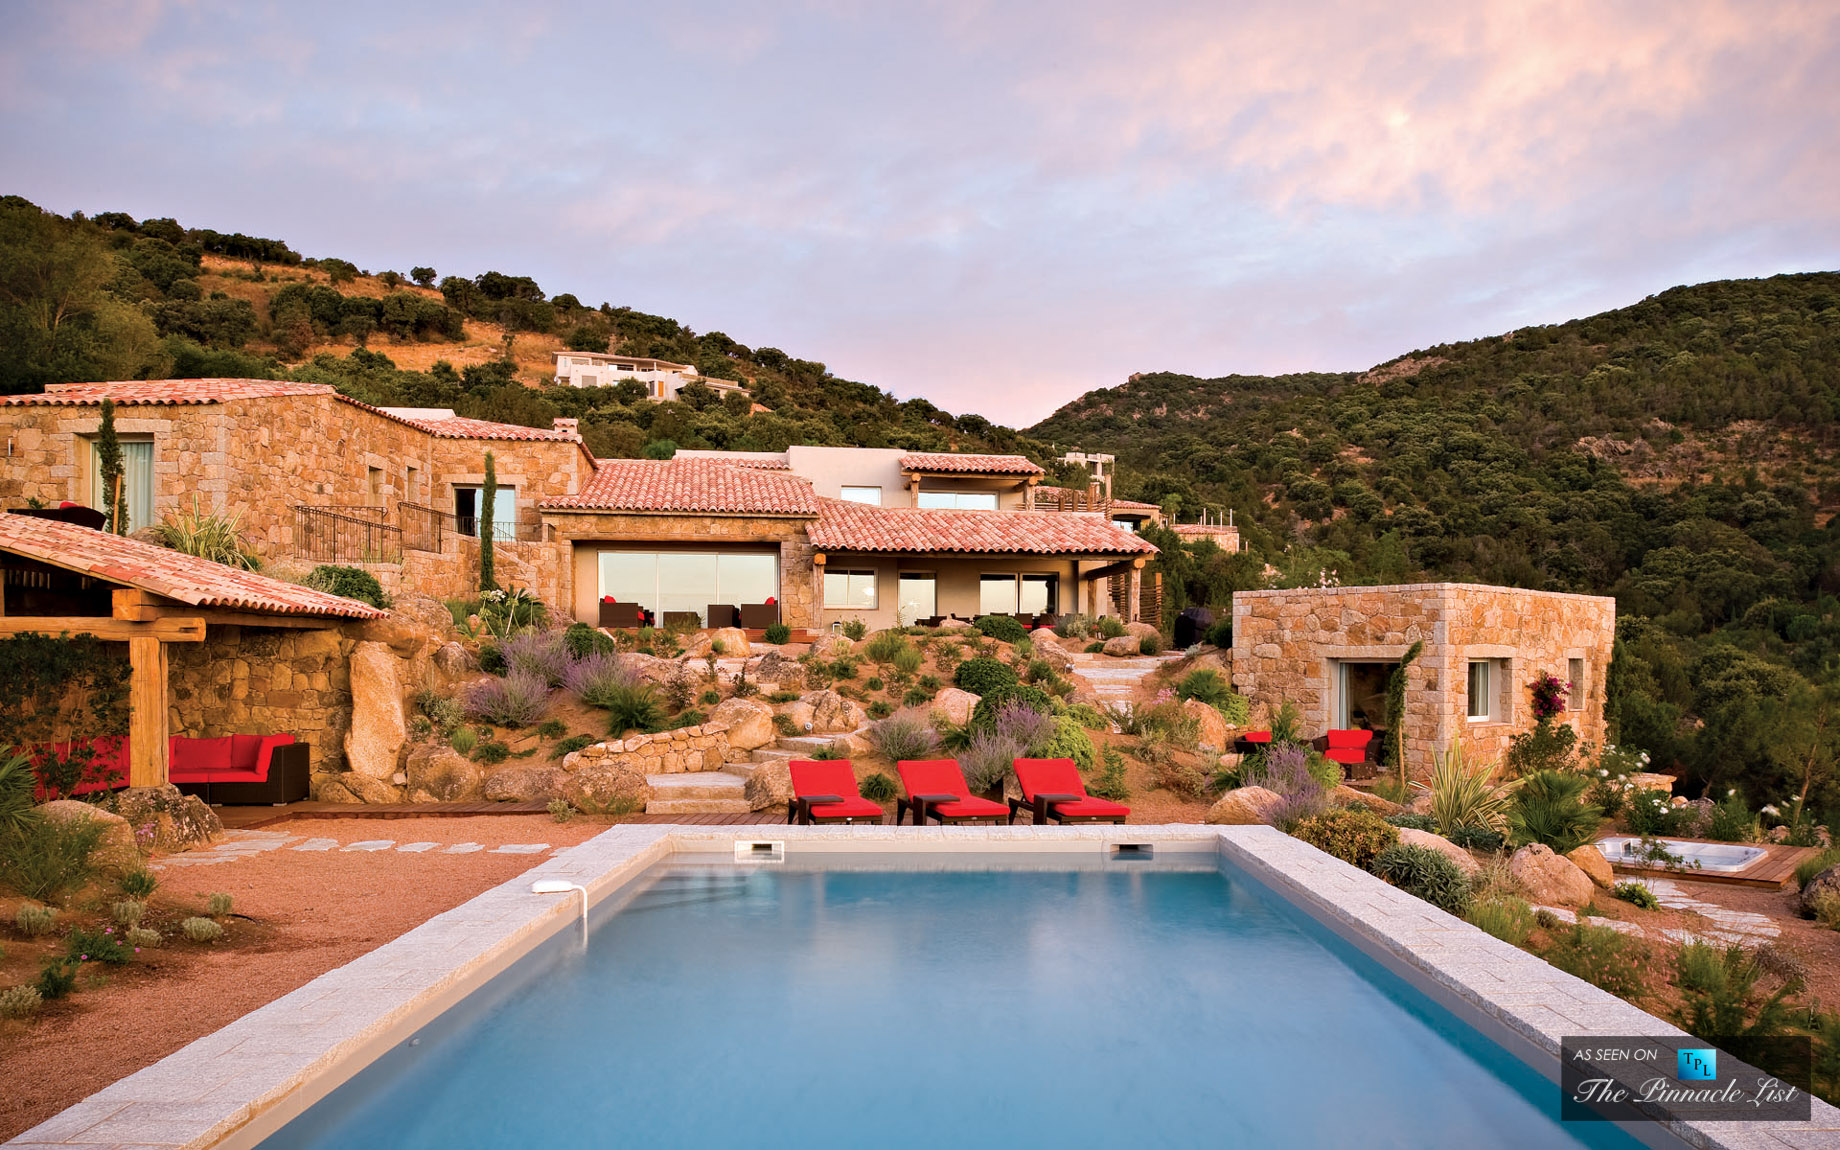 Villa Scorpio - Corsica, France - The 5 Best Rural Villas in the Mediterranean for Luxury Retreats